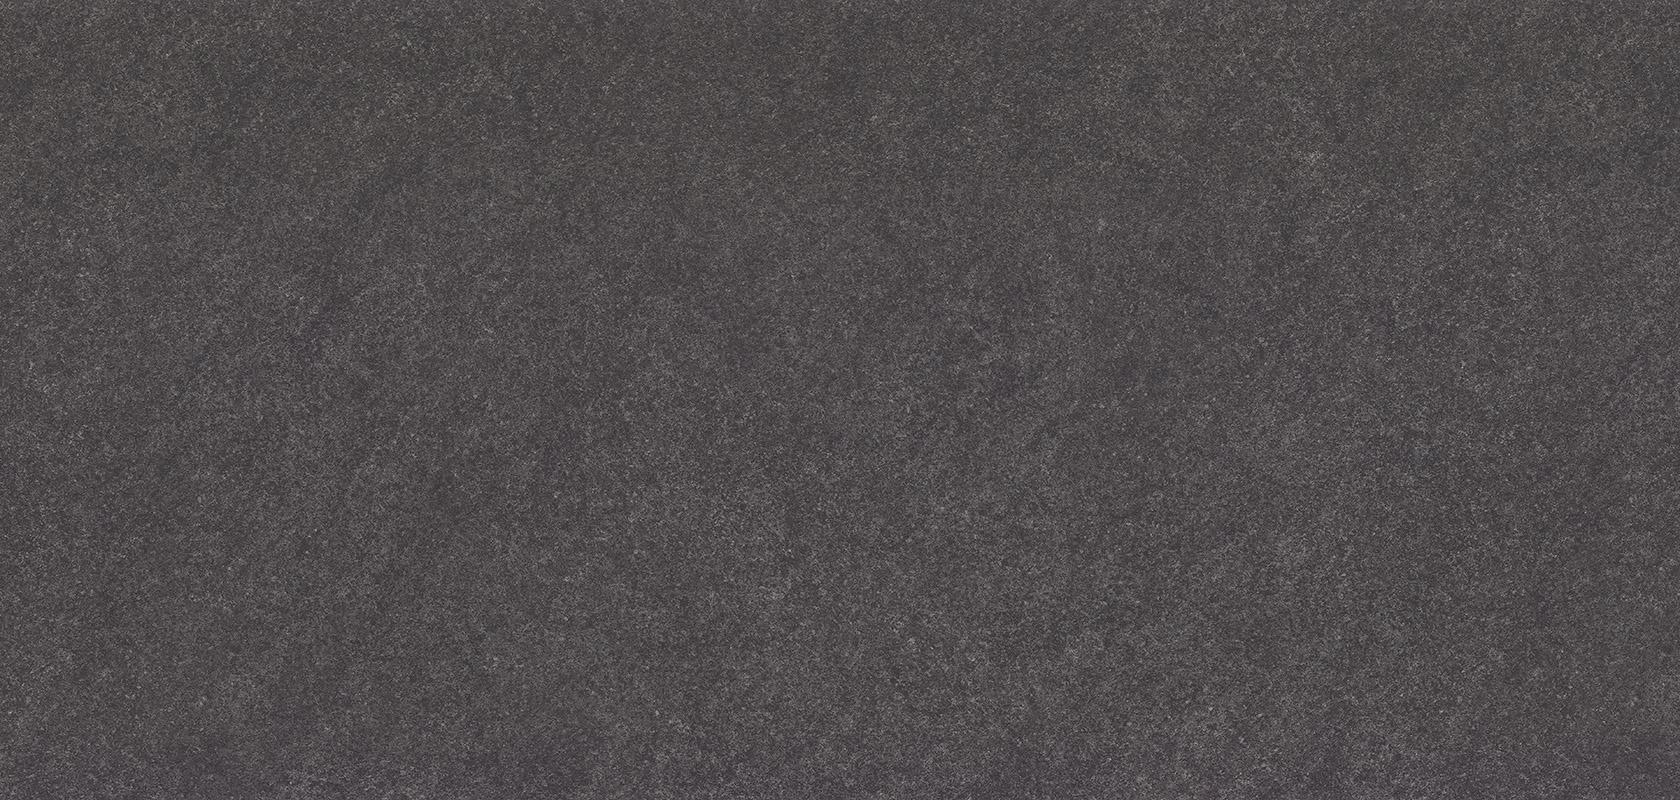 Kuchentime encimera Xtra Diseño granito sólido